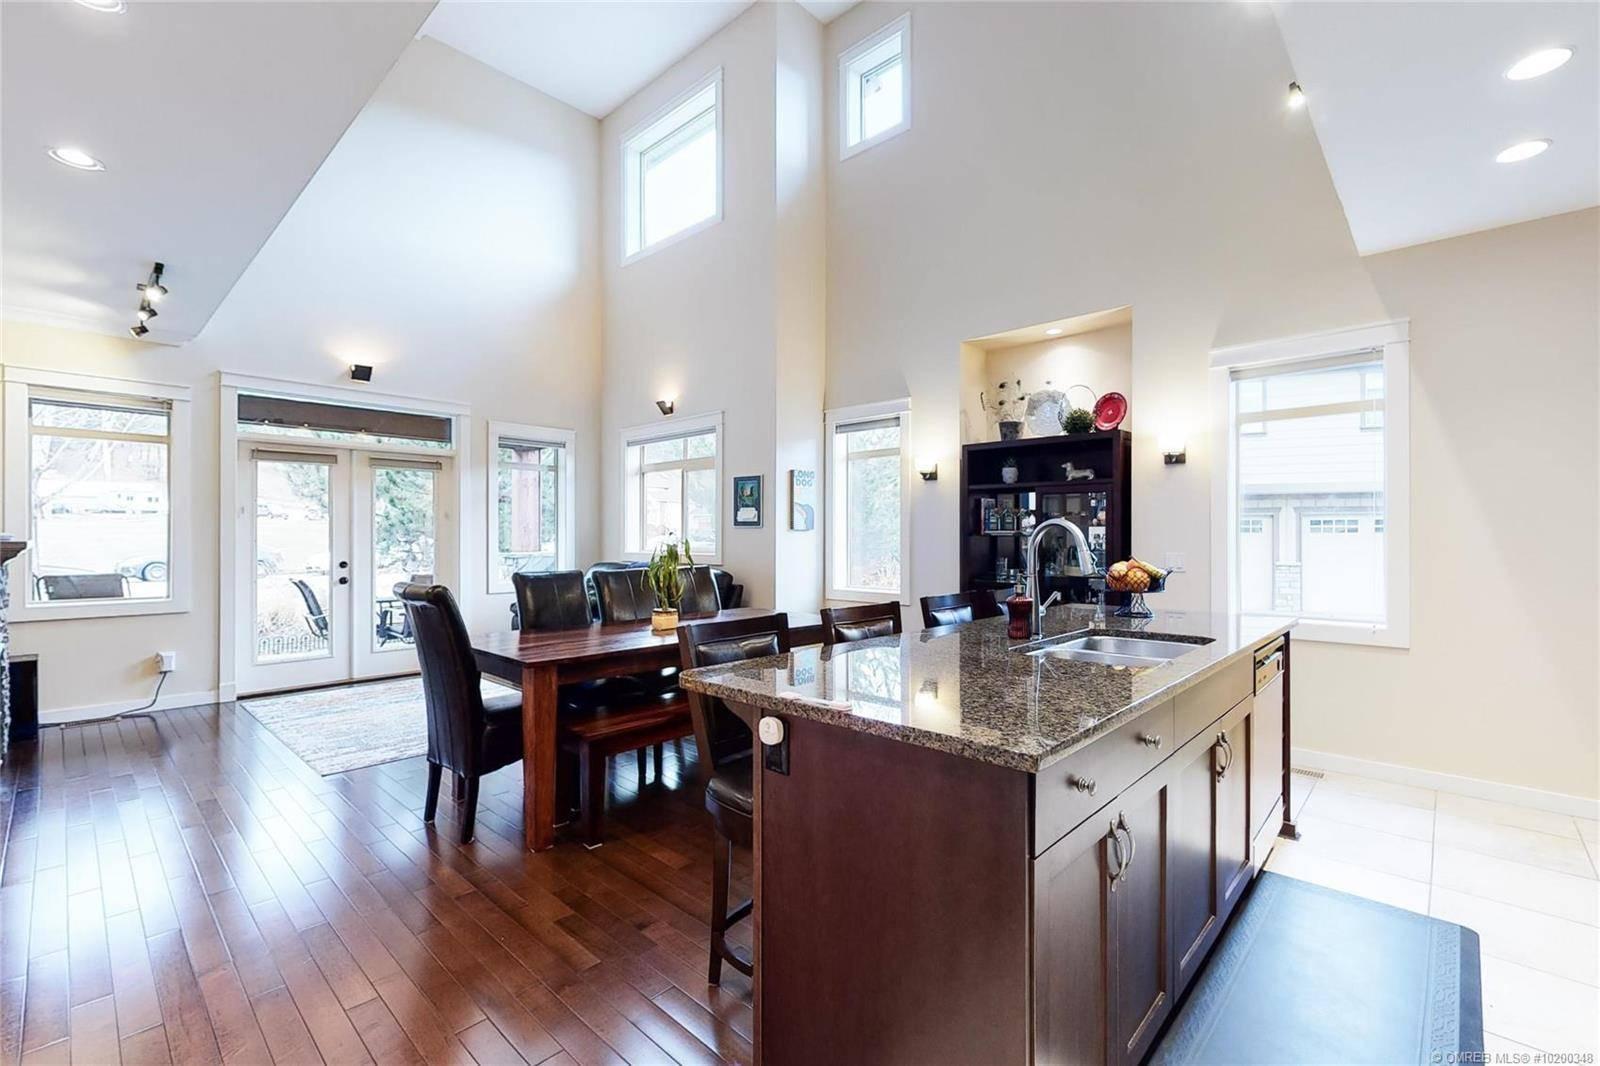 Townhouse for sale at 511 Yates Rd Unit 129 Kelowna British Columbia - MLS: 10200348